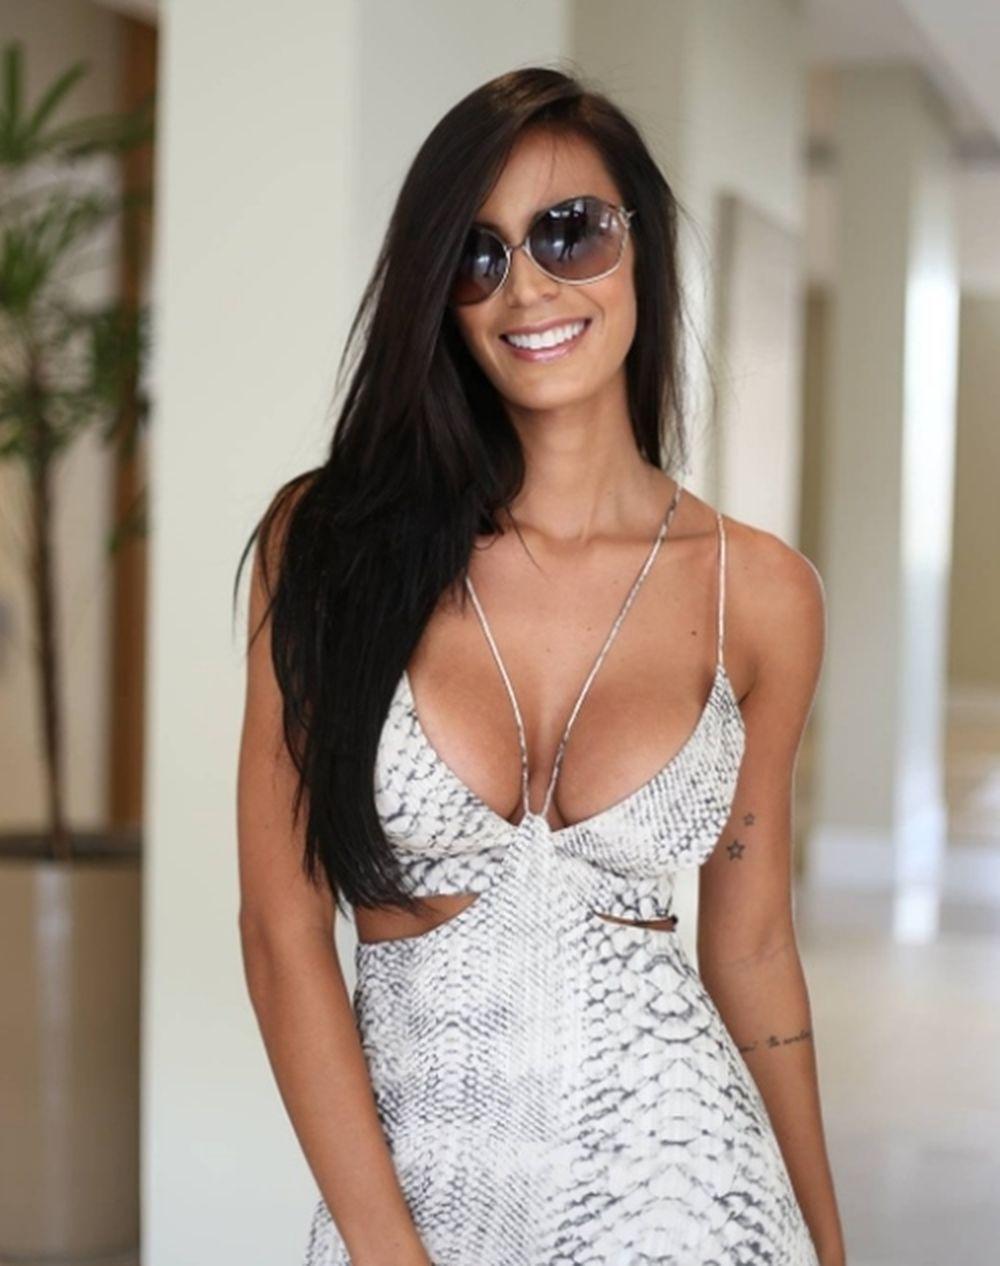 Snapchat Giulia Borio naked (84 photo), Topless, Cleavage, Boobs, see through 2020